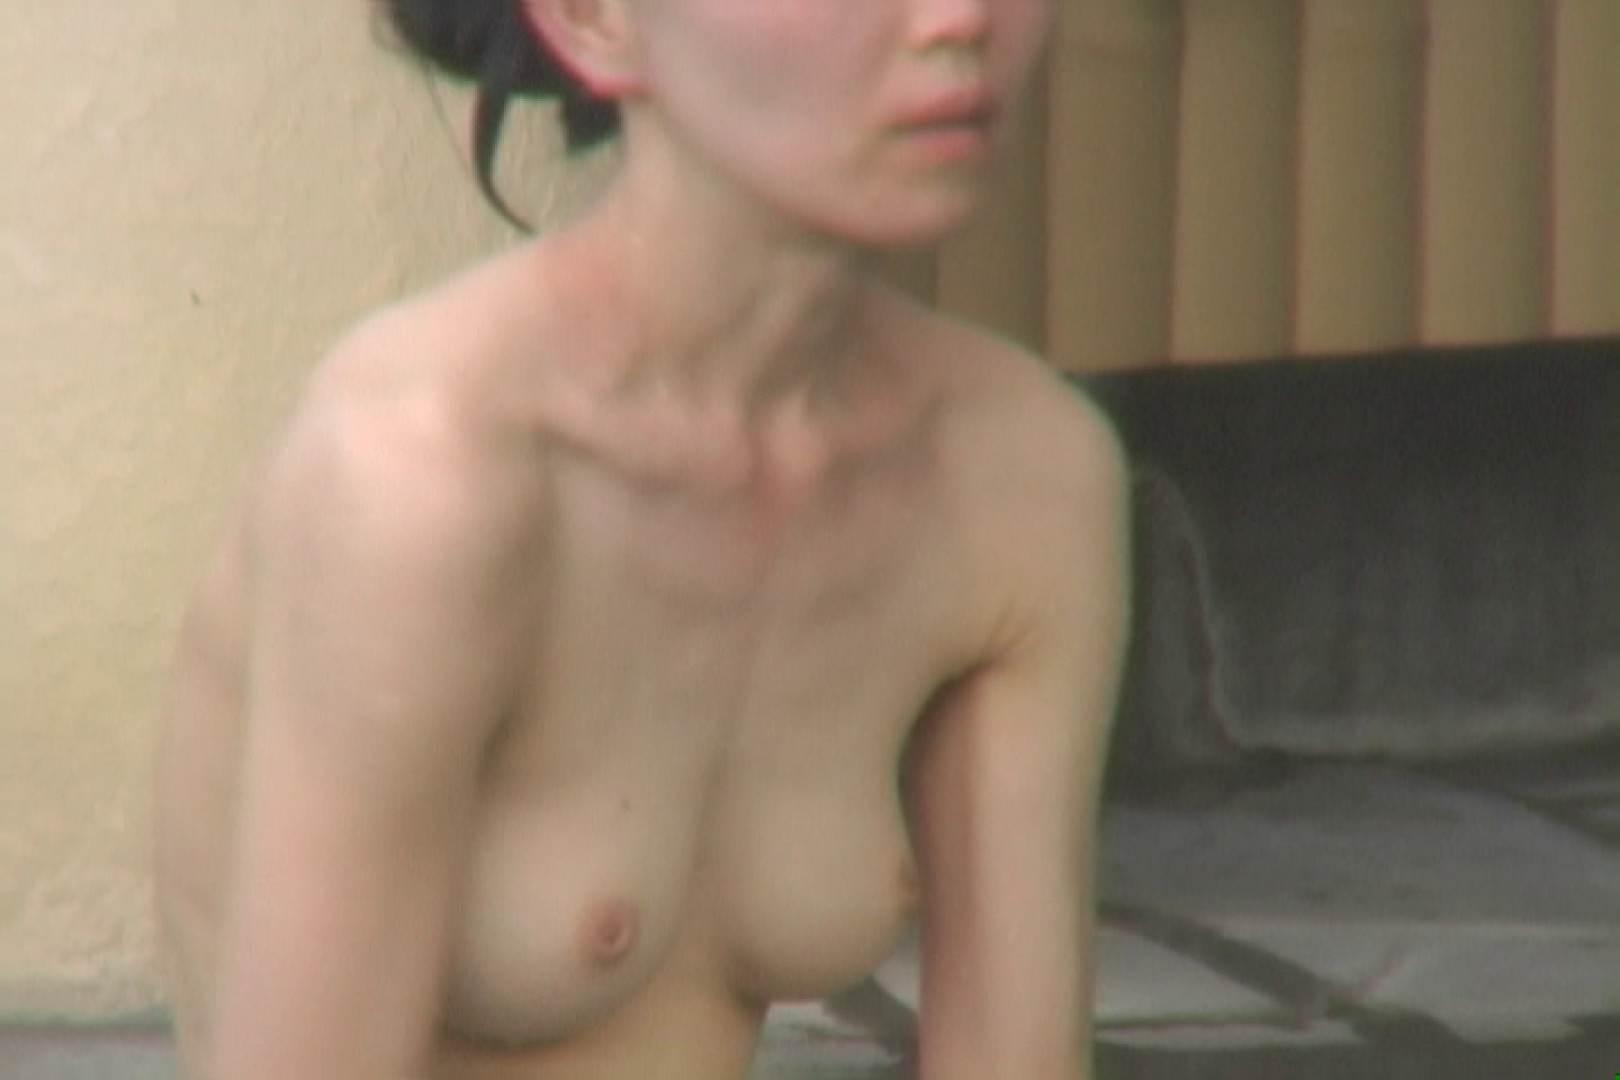 Aquaな露天風呂Vol.577 美しいOLの裸体 おめこ無修正動画無料 101pic 95